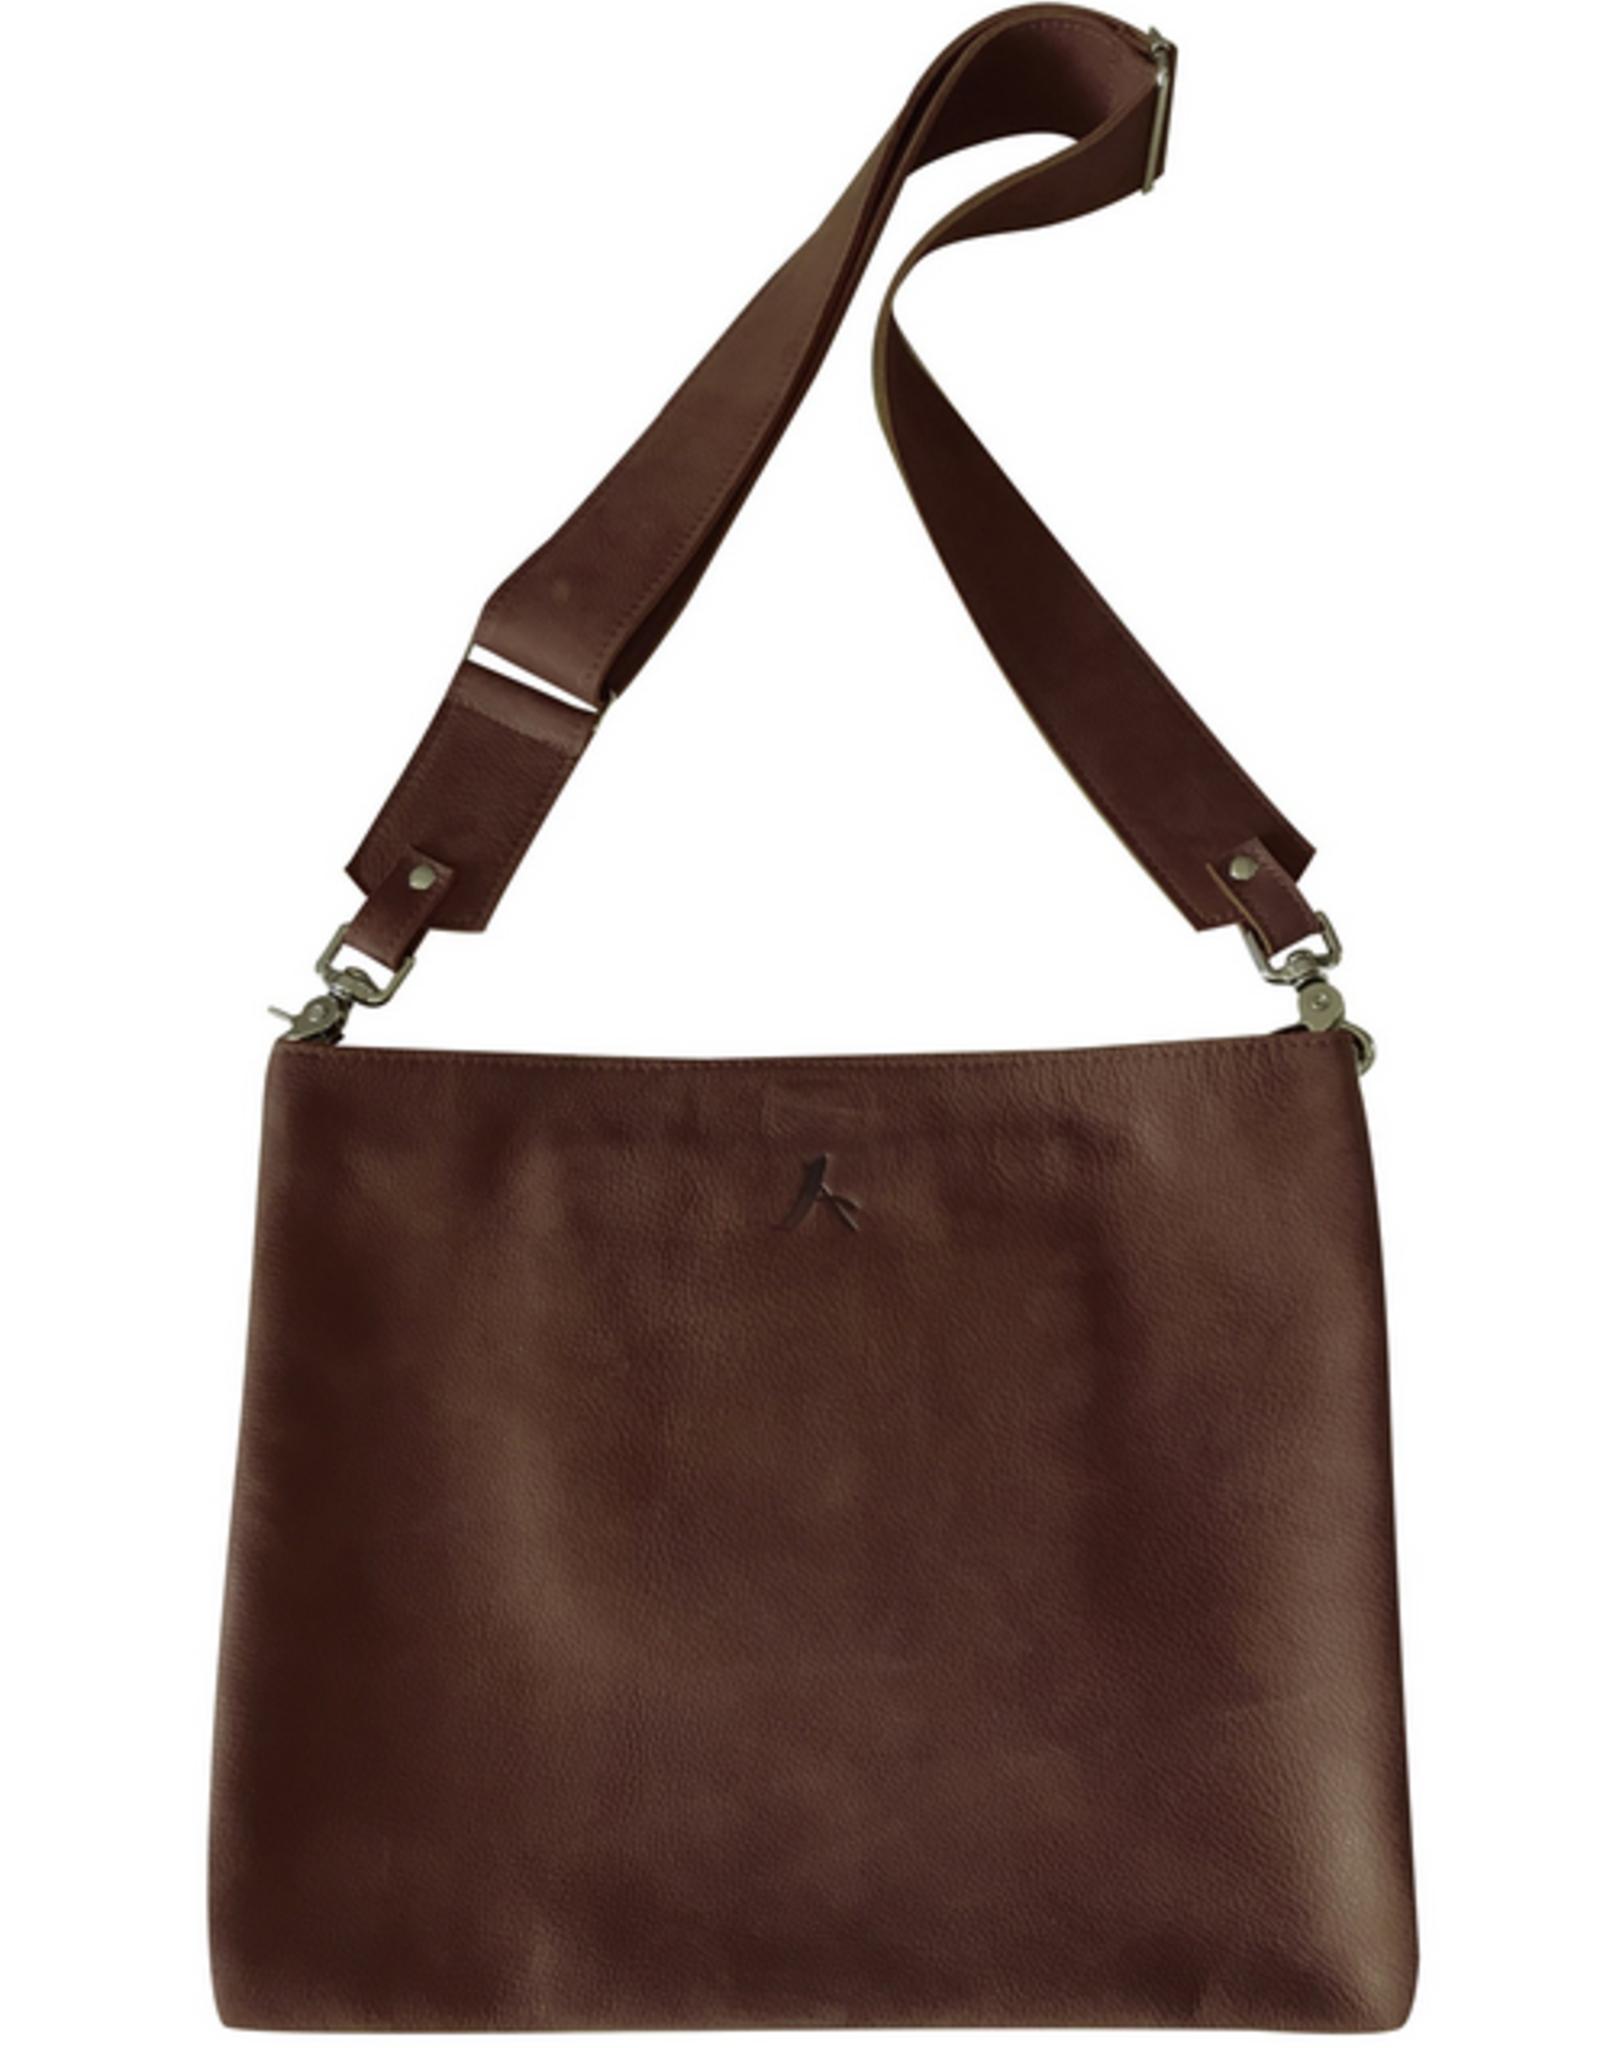 ALICIA DAKTERIS ALODIE Crossbody Leather Bag